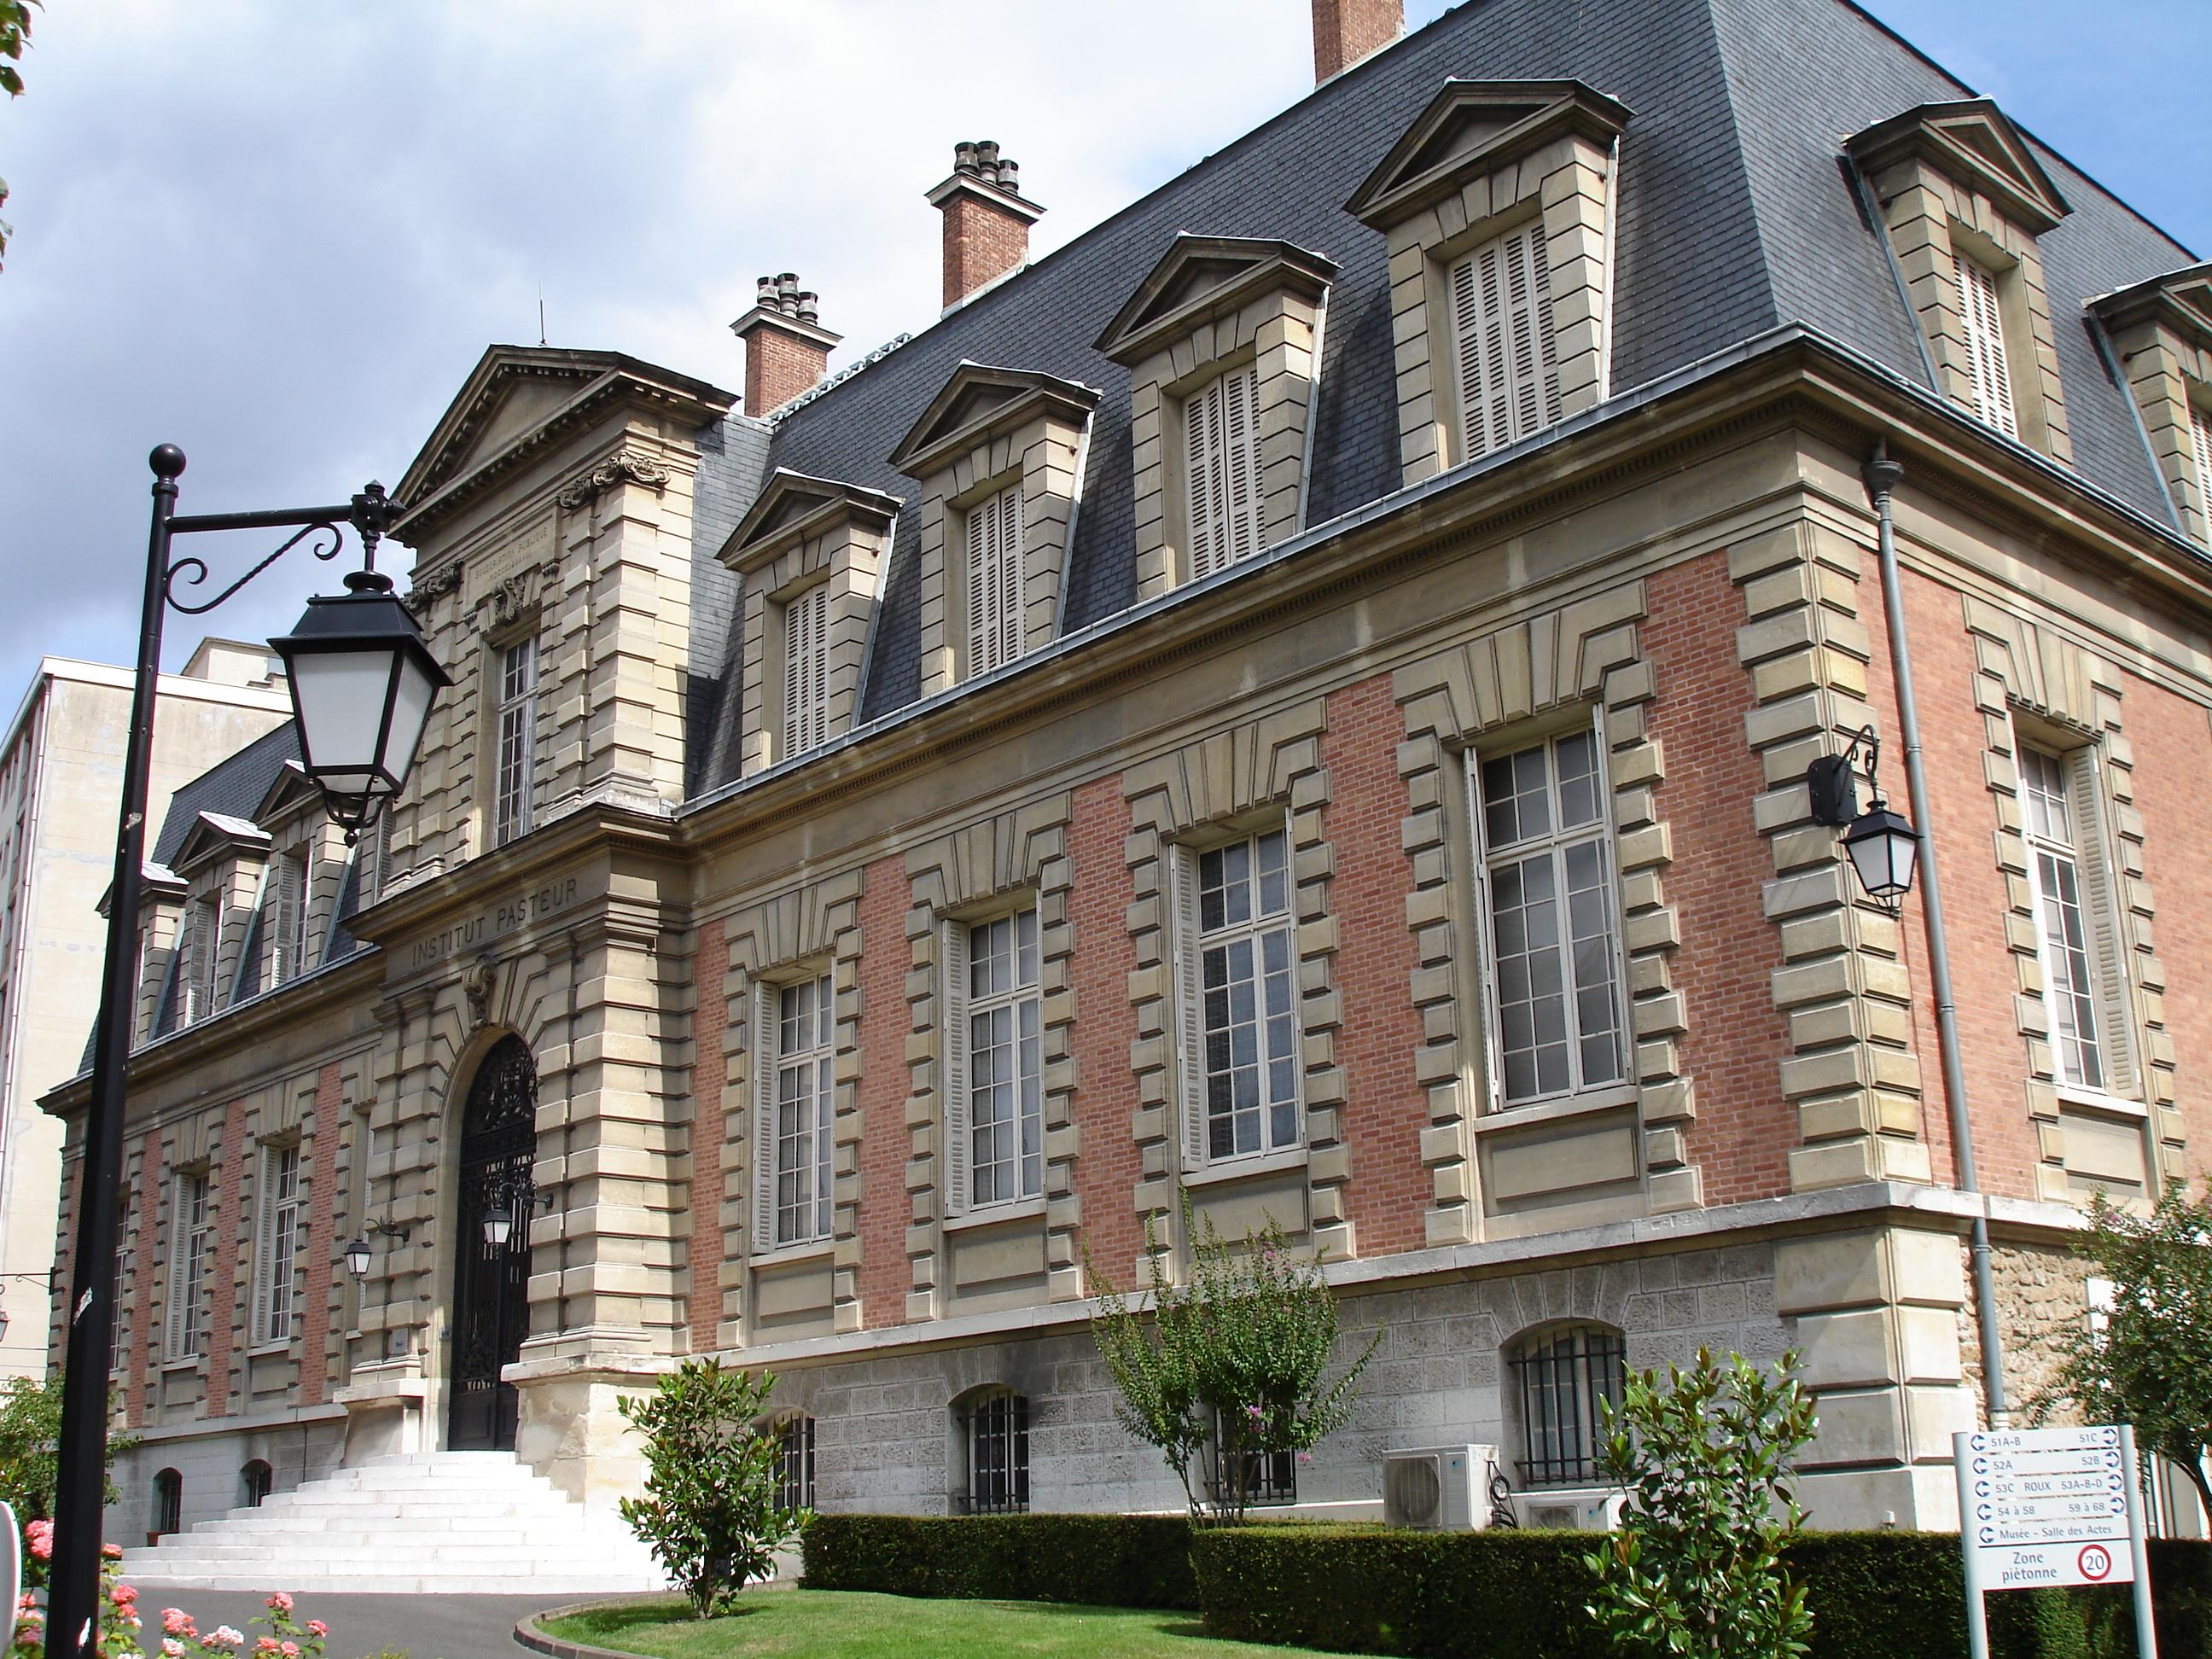 http://fr.academic.ru/pictures/frwiki/73/Institut_Pasteur,_Paris_1.jpg